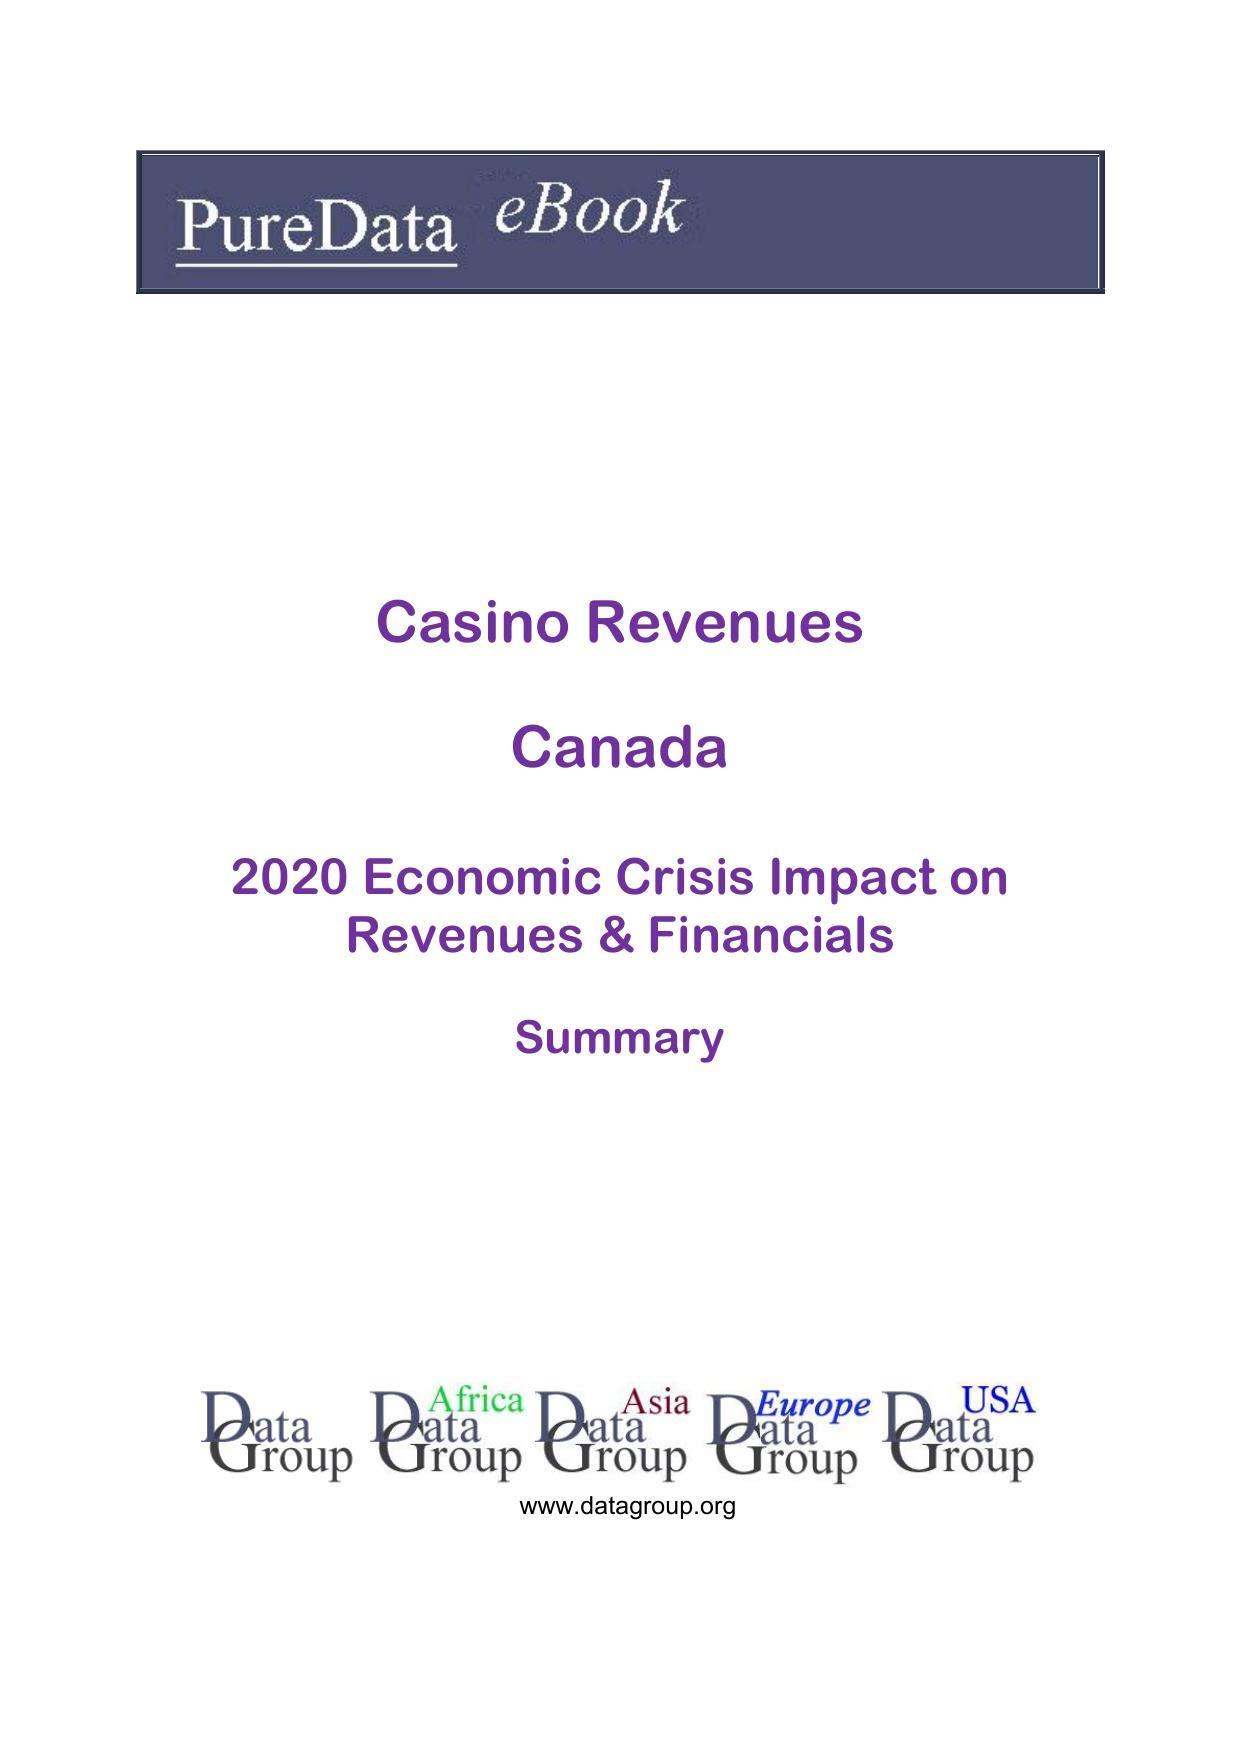 Casino Revenues Canada Summary: 2020 Economic Crisis Impact on Revenues & Financials